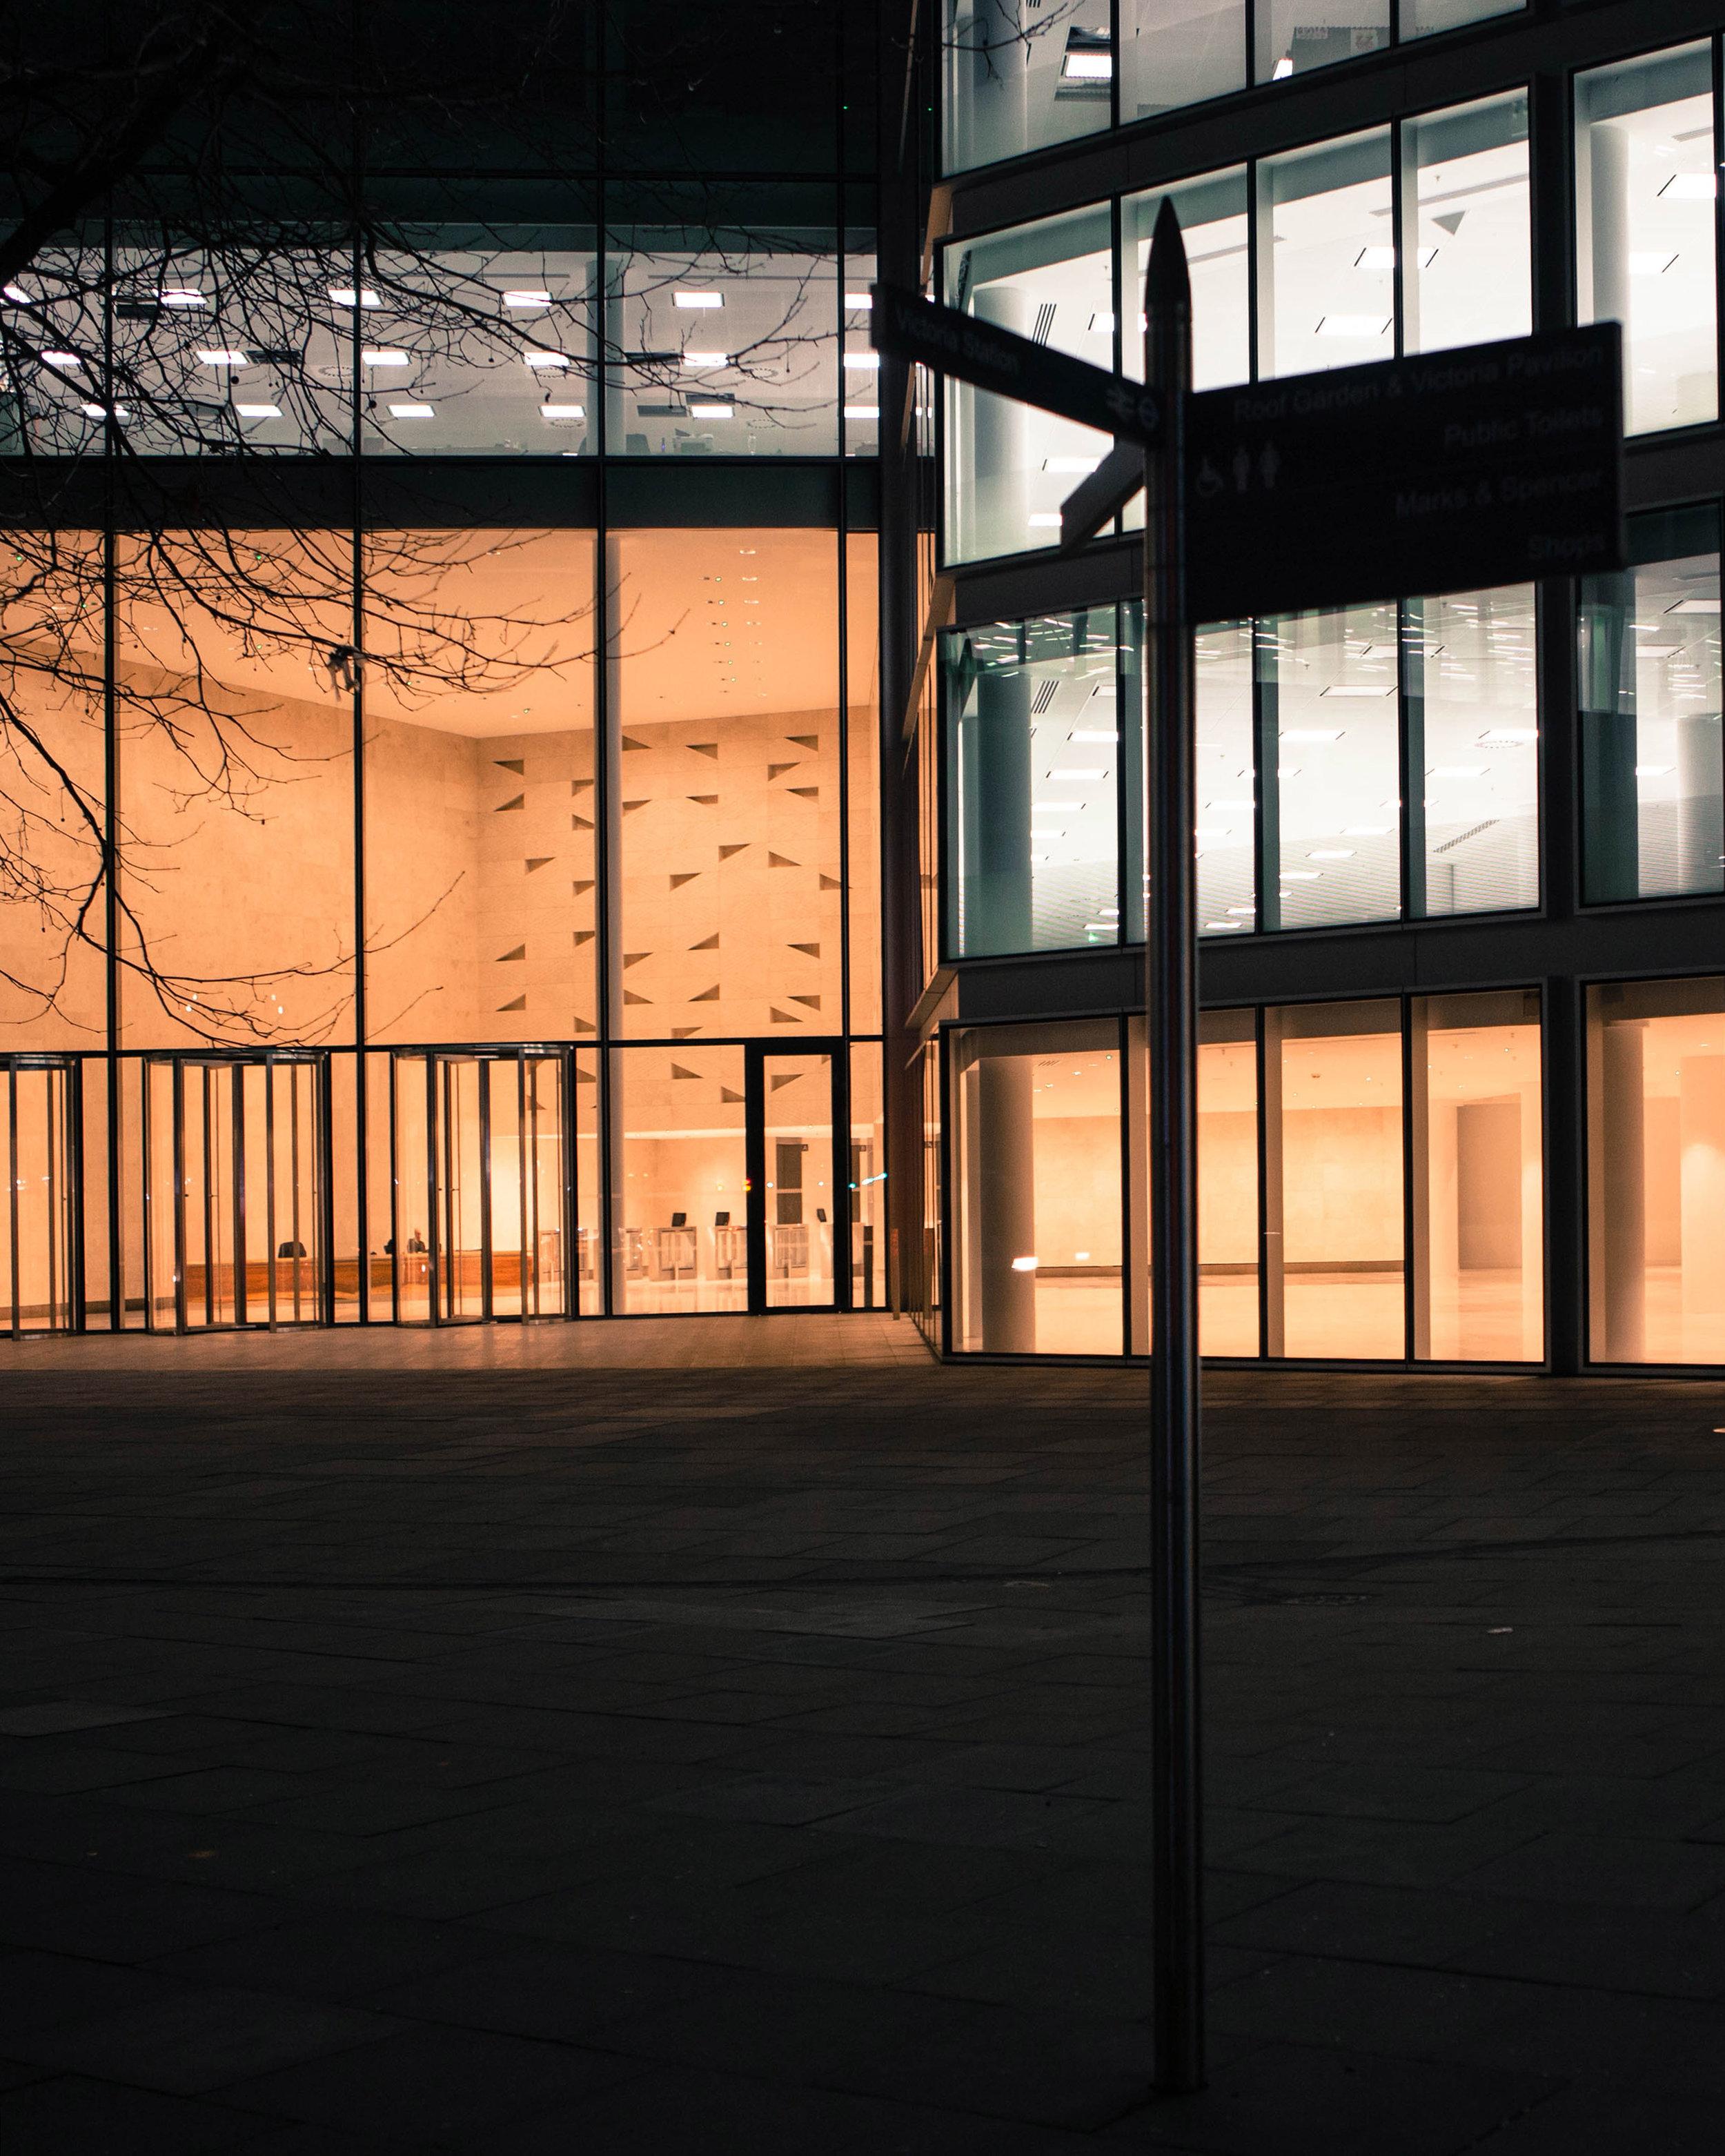 Street-near-the-palace-at-night.jpg